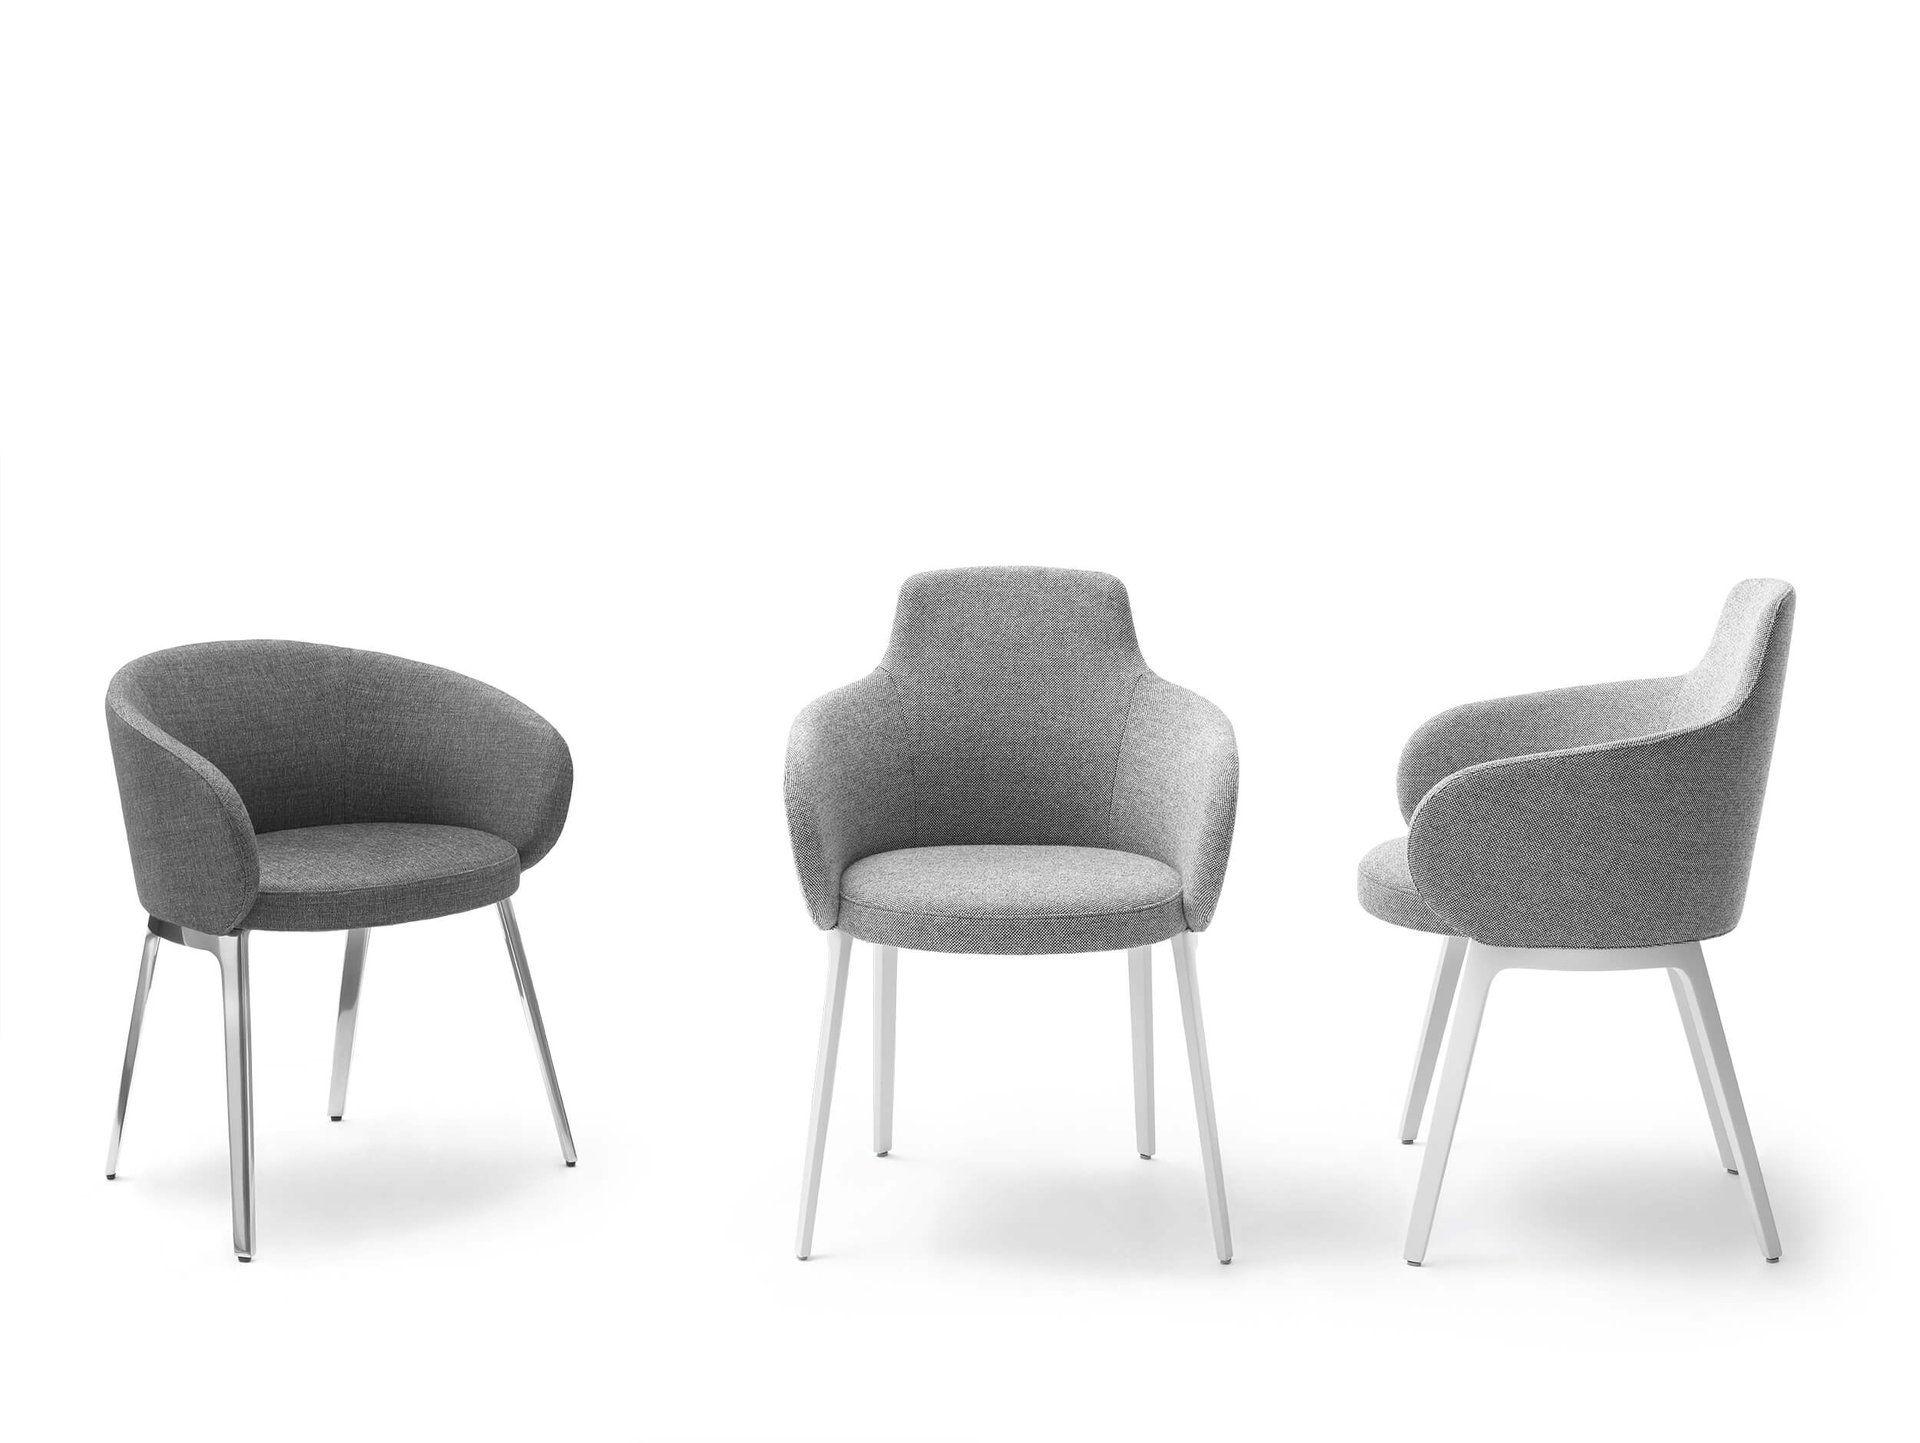 Ordinaire Roc Chair: COR